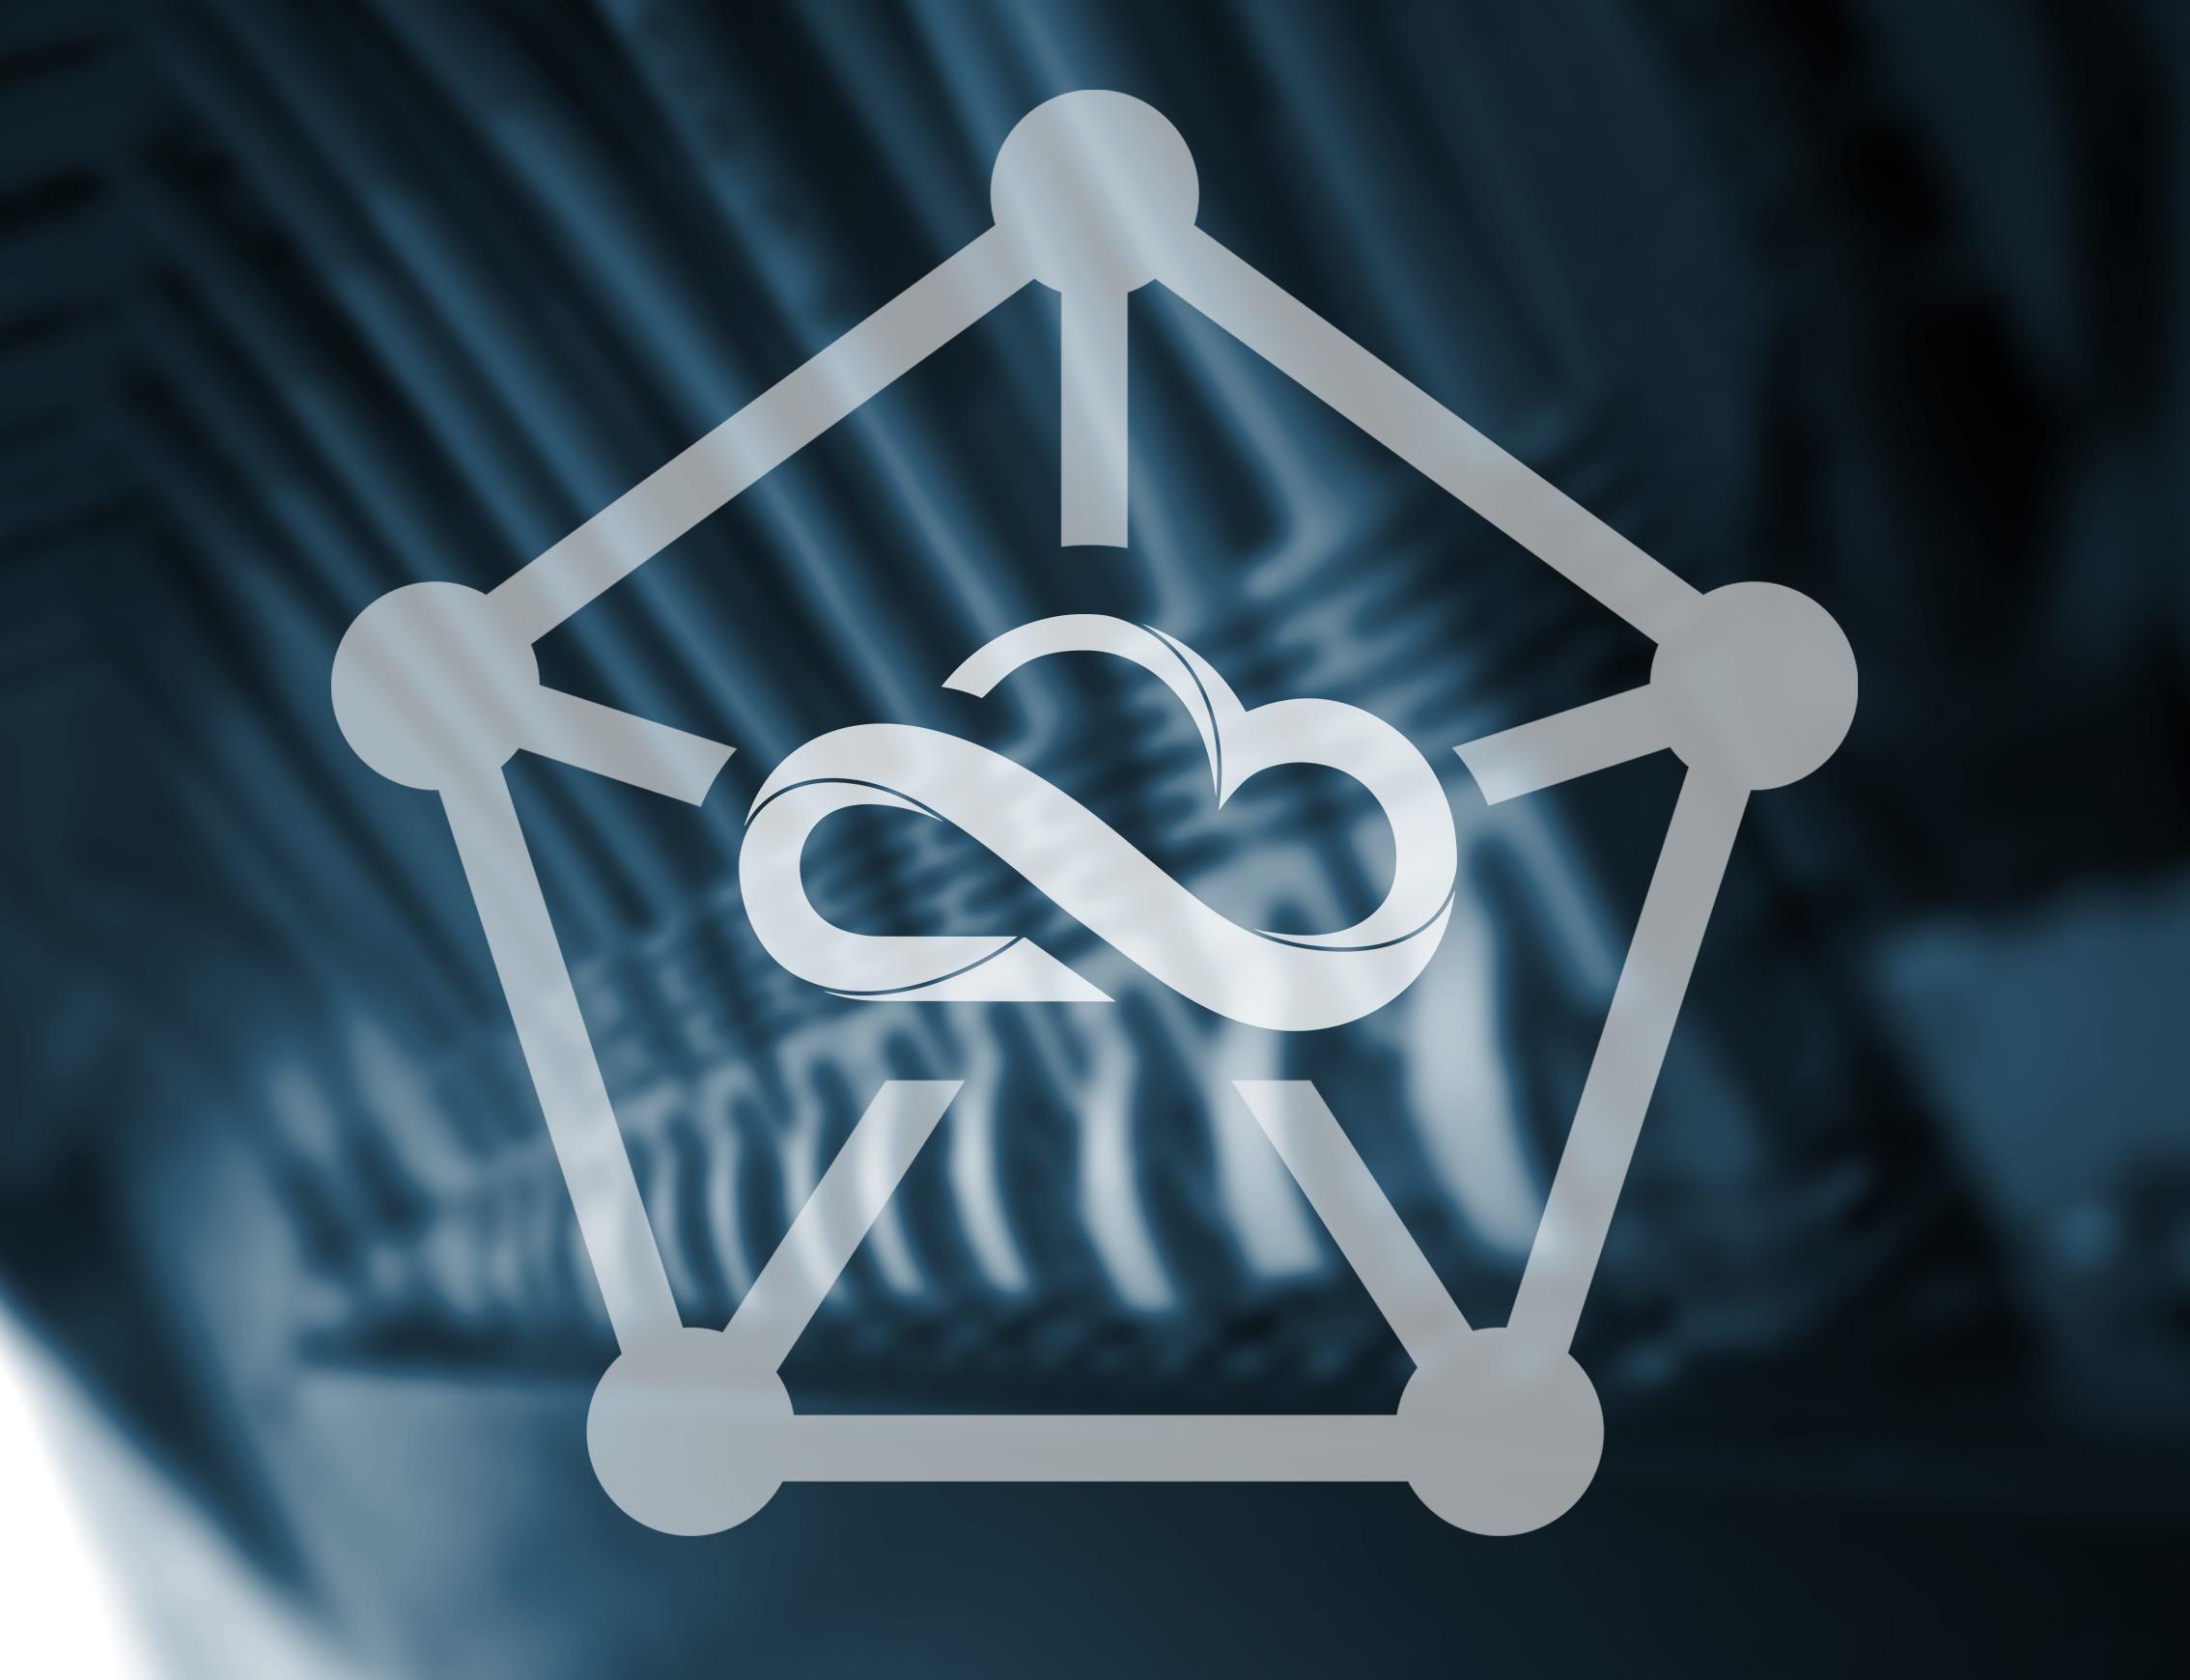 CloudCooler to Edge graphic.jpg